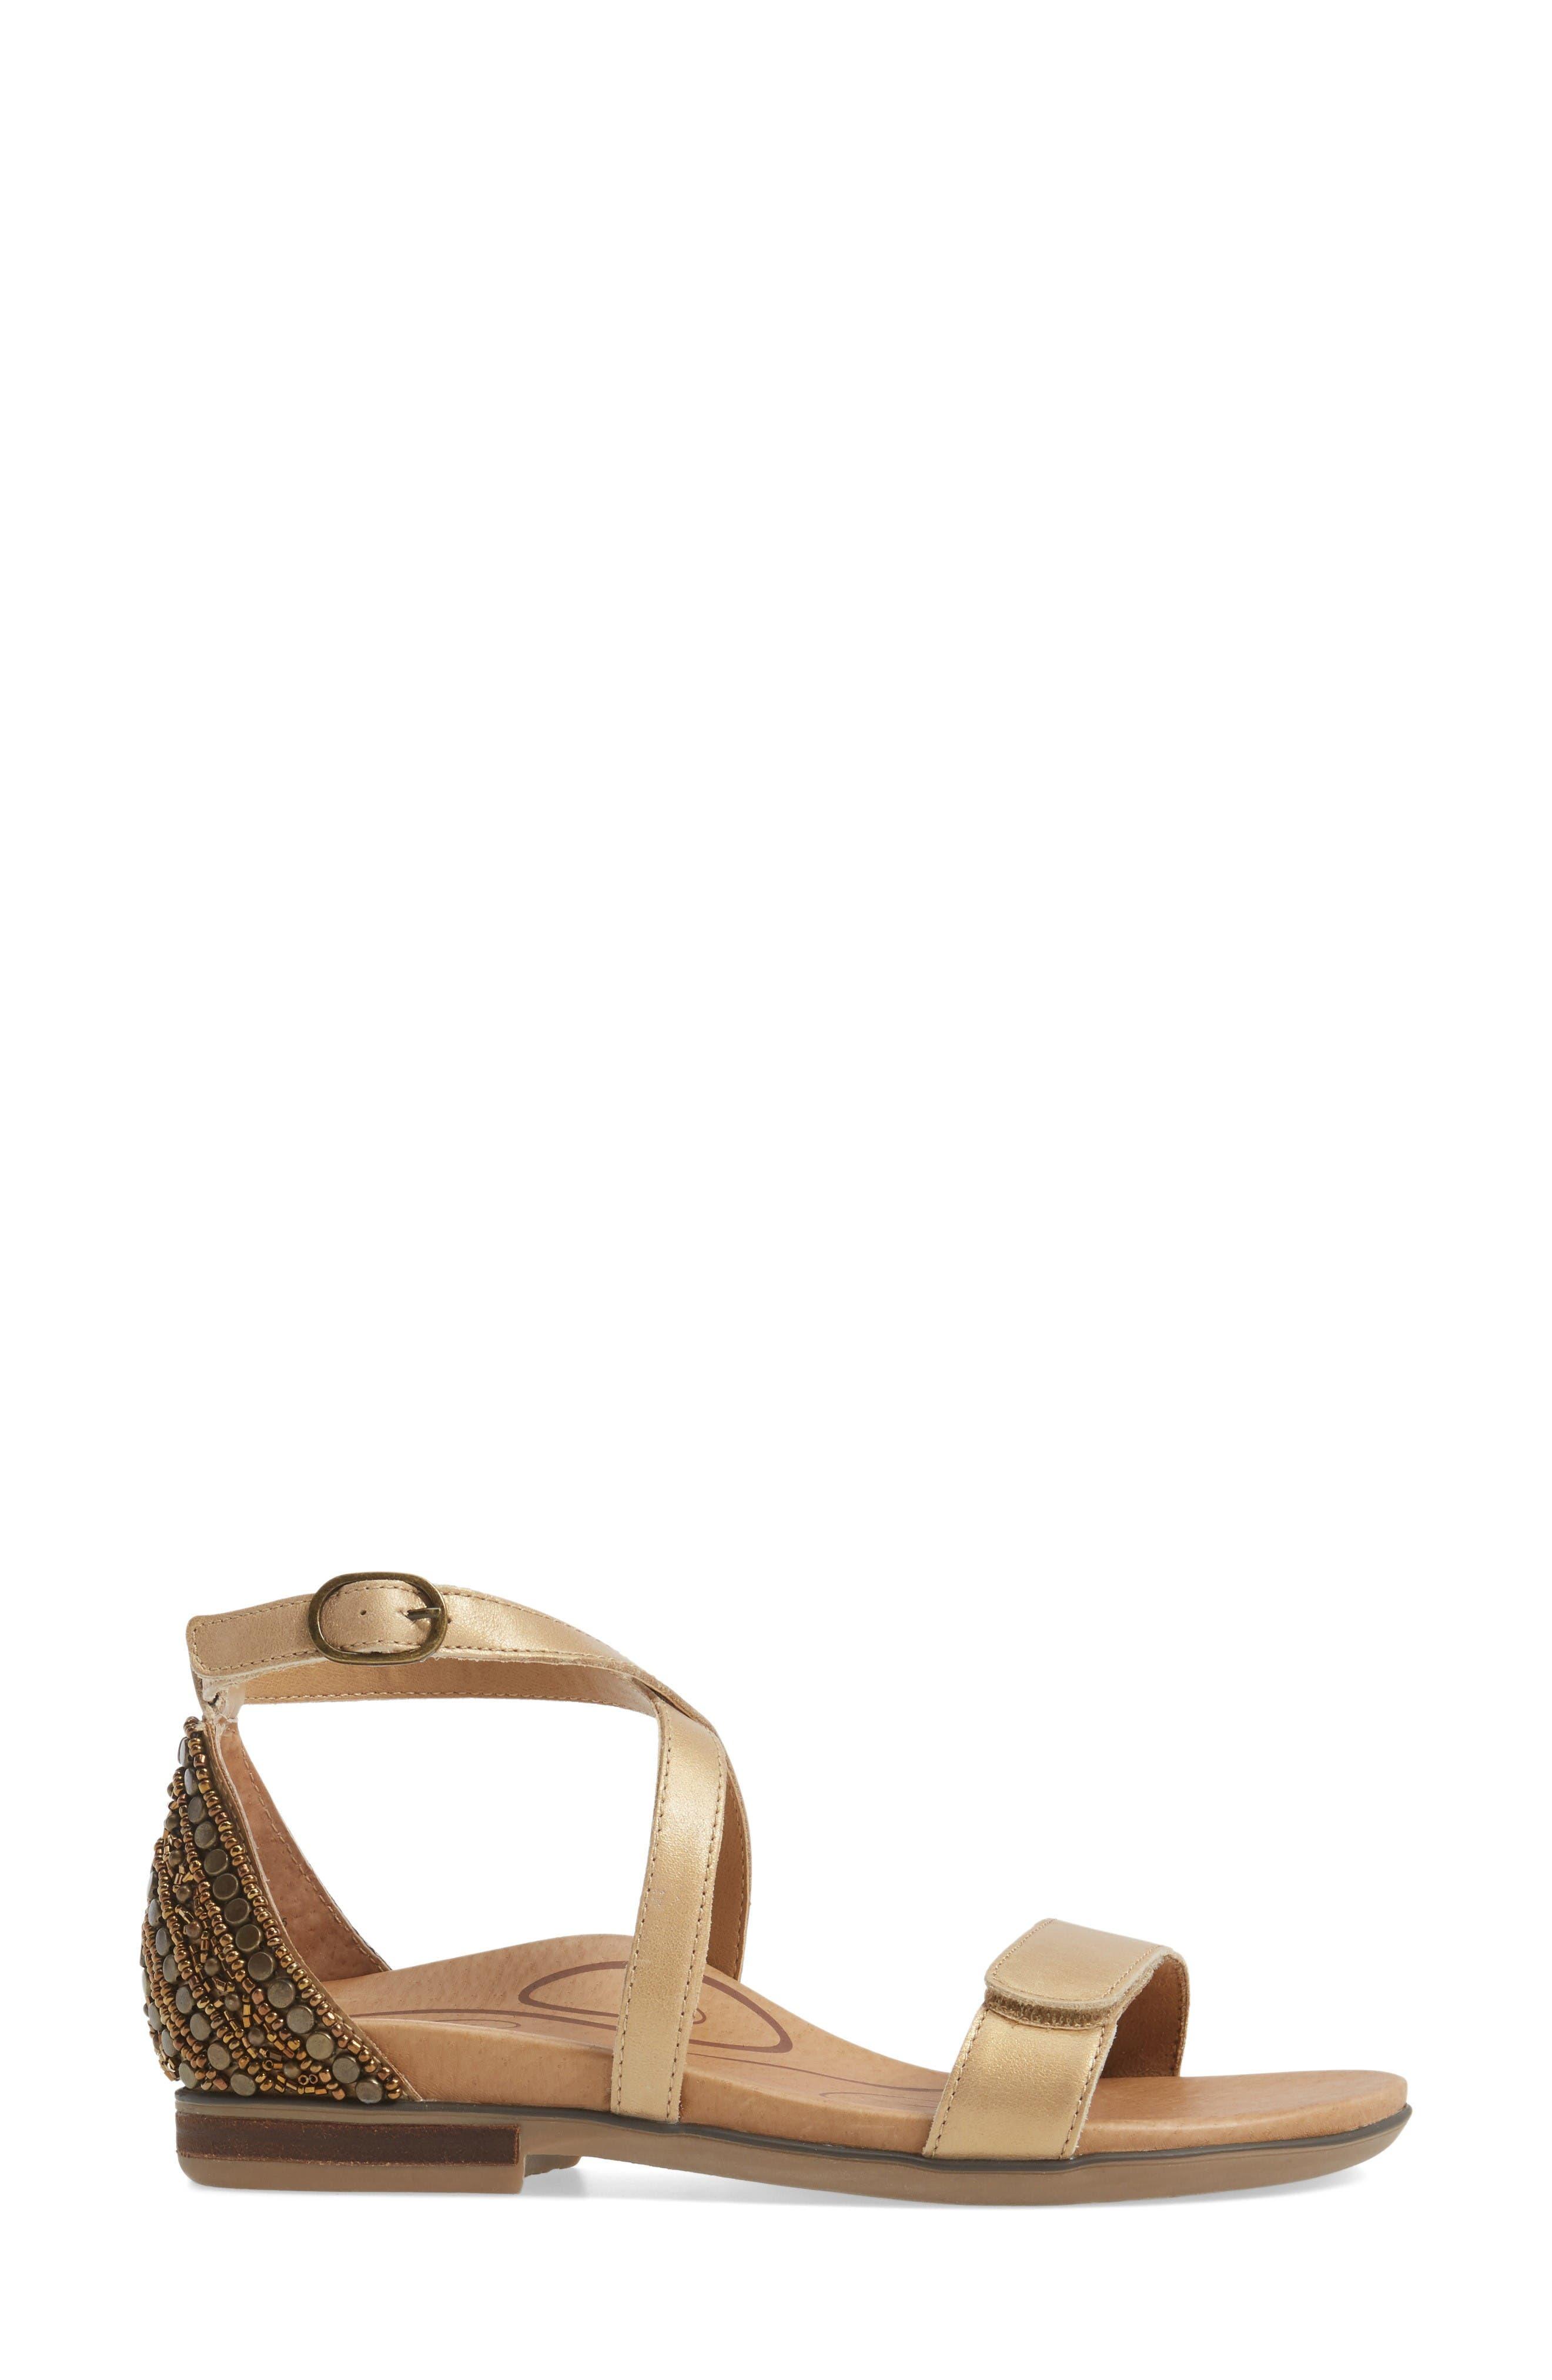 Brenda Embellished Cross Strap Sandal,                             Alternate thumbnail 3, color,                             Stone Leather